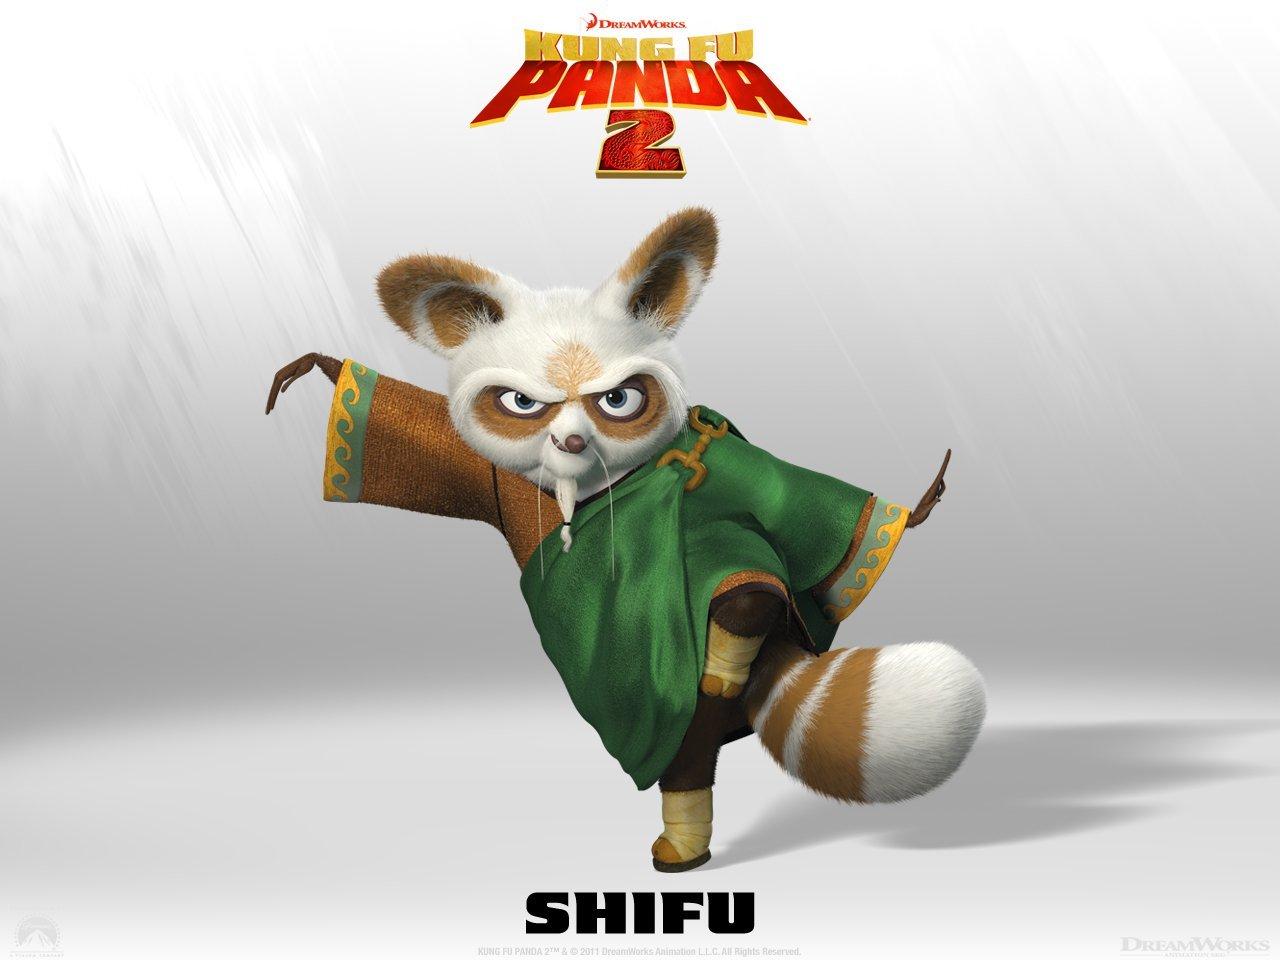 http://1.bp.blogspot.com/-4qKZHCfRyfs/TYgegNVy6hI/AAAAAAAAAGE/brhUlJ0WC-4/s1600/Kung-Fu-Panda-2-Wallpaper-Shifu.jpg